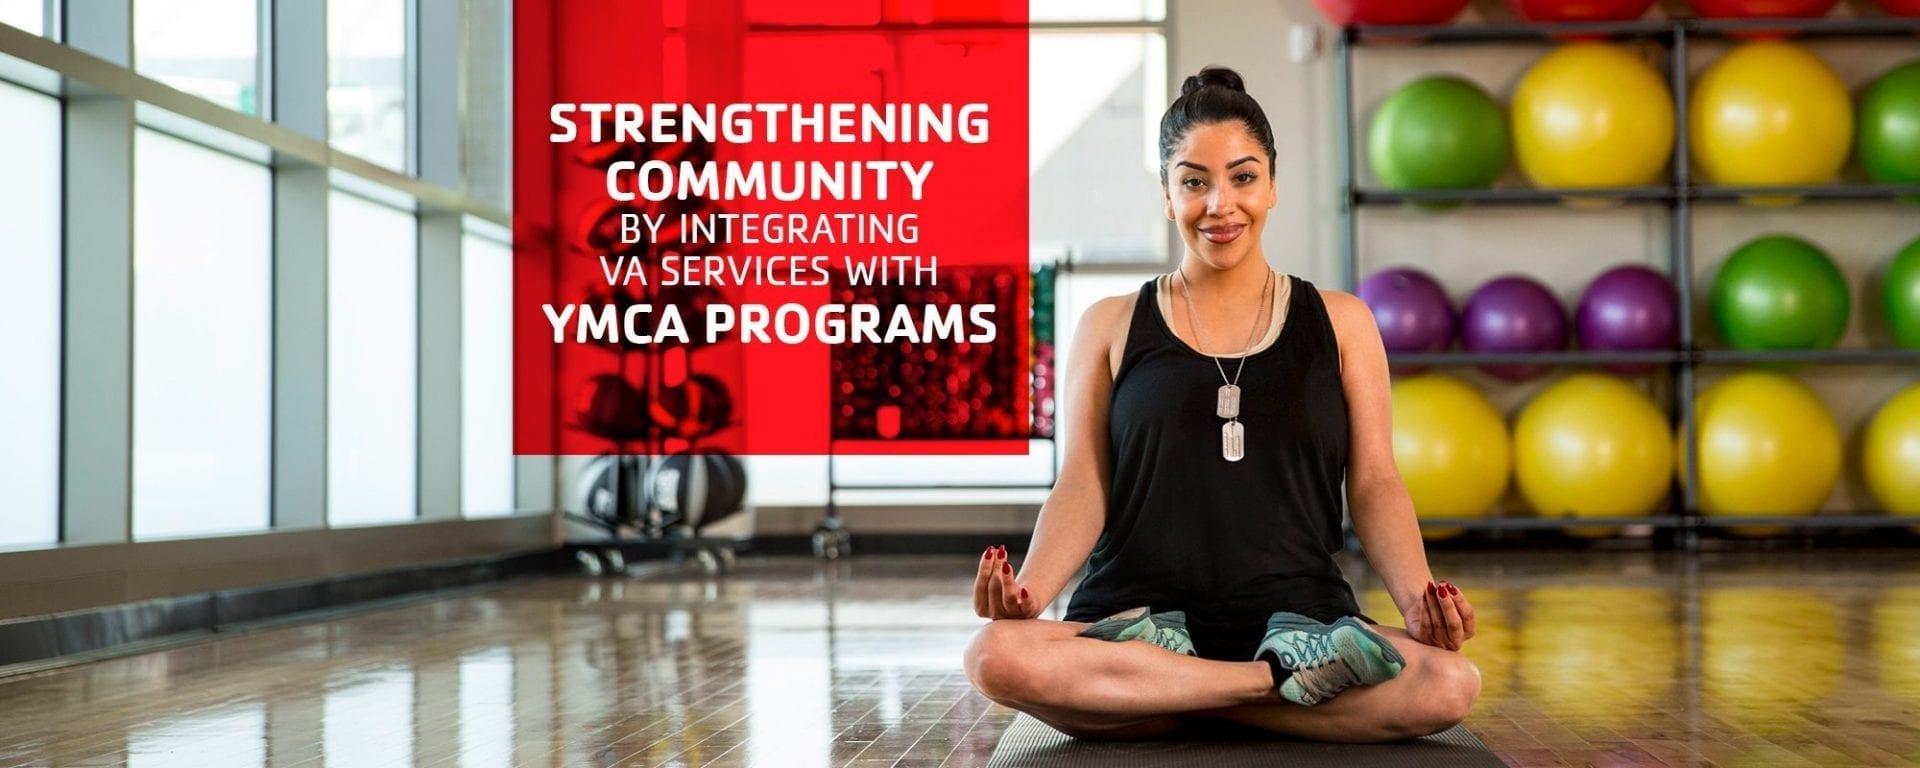 VA Services - YLovesVets